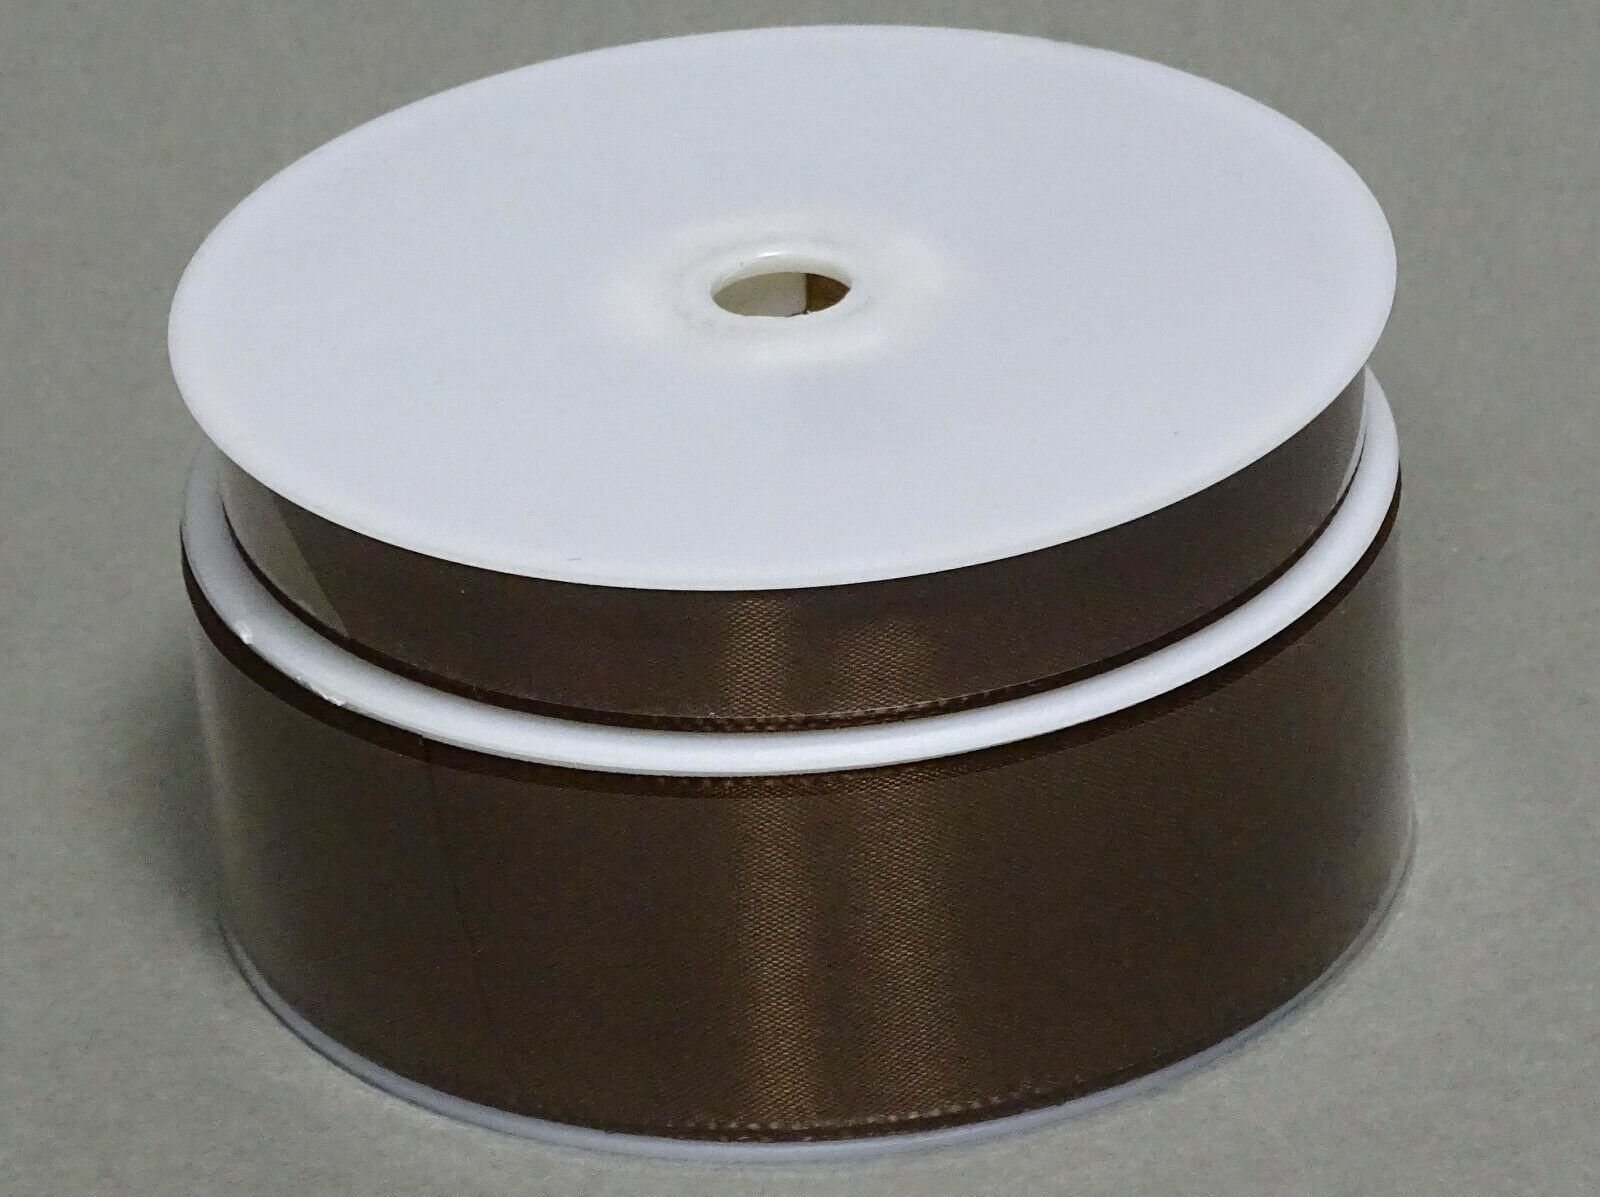 Seidenband Schleifenband 50 m x 15 / 25 / 40mm Dekoband ab 0,08€/m Geschenkband  - Braun 132, 15 mm x 50 m